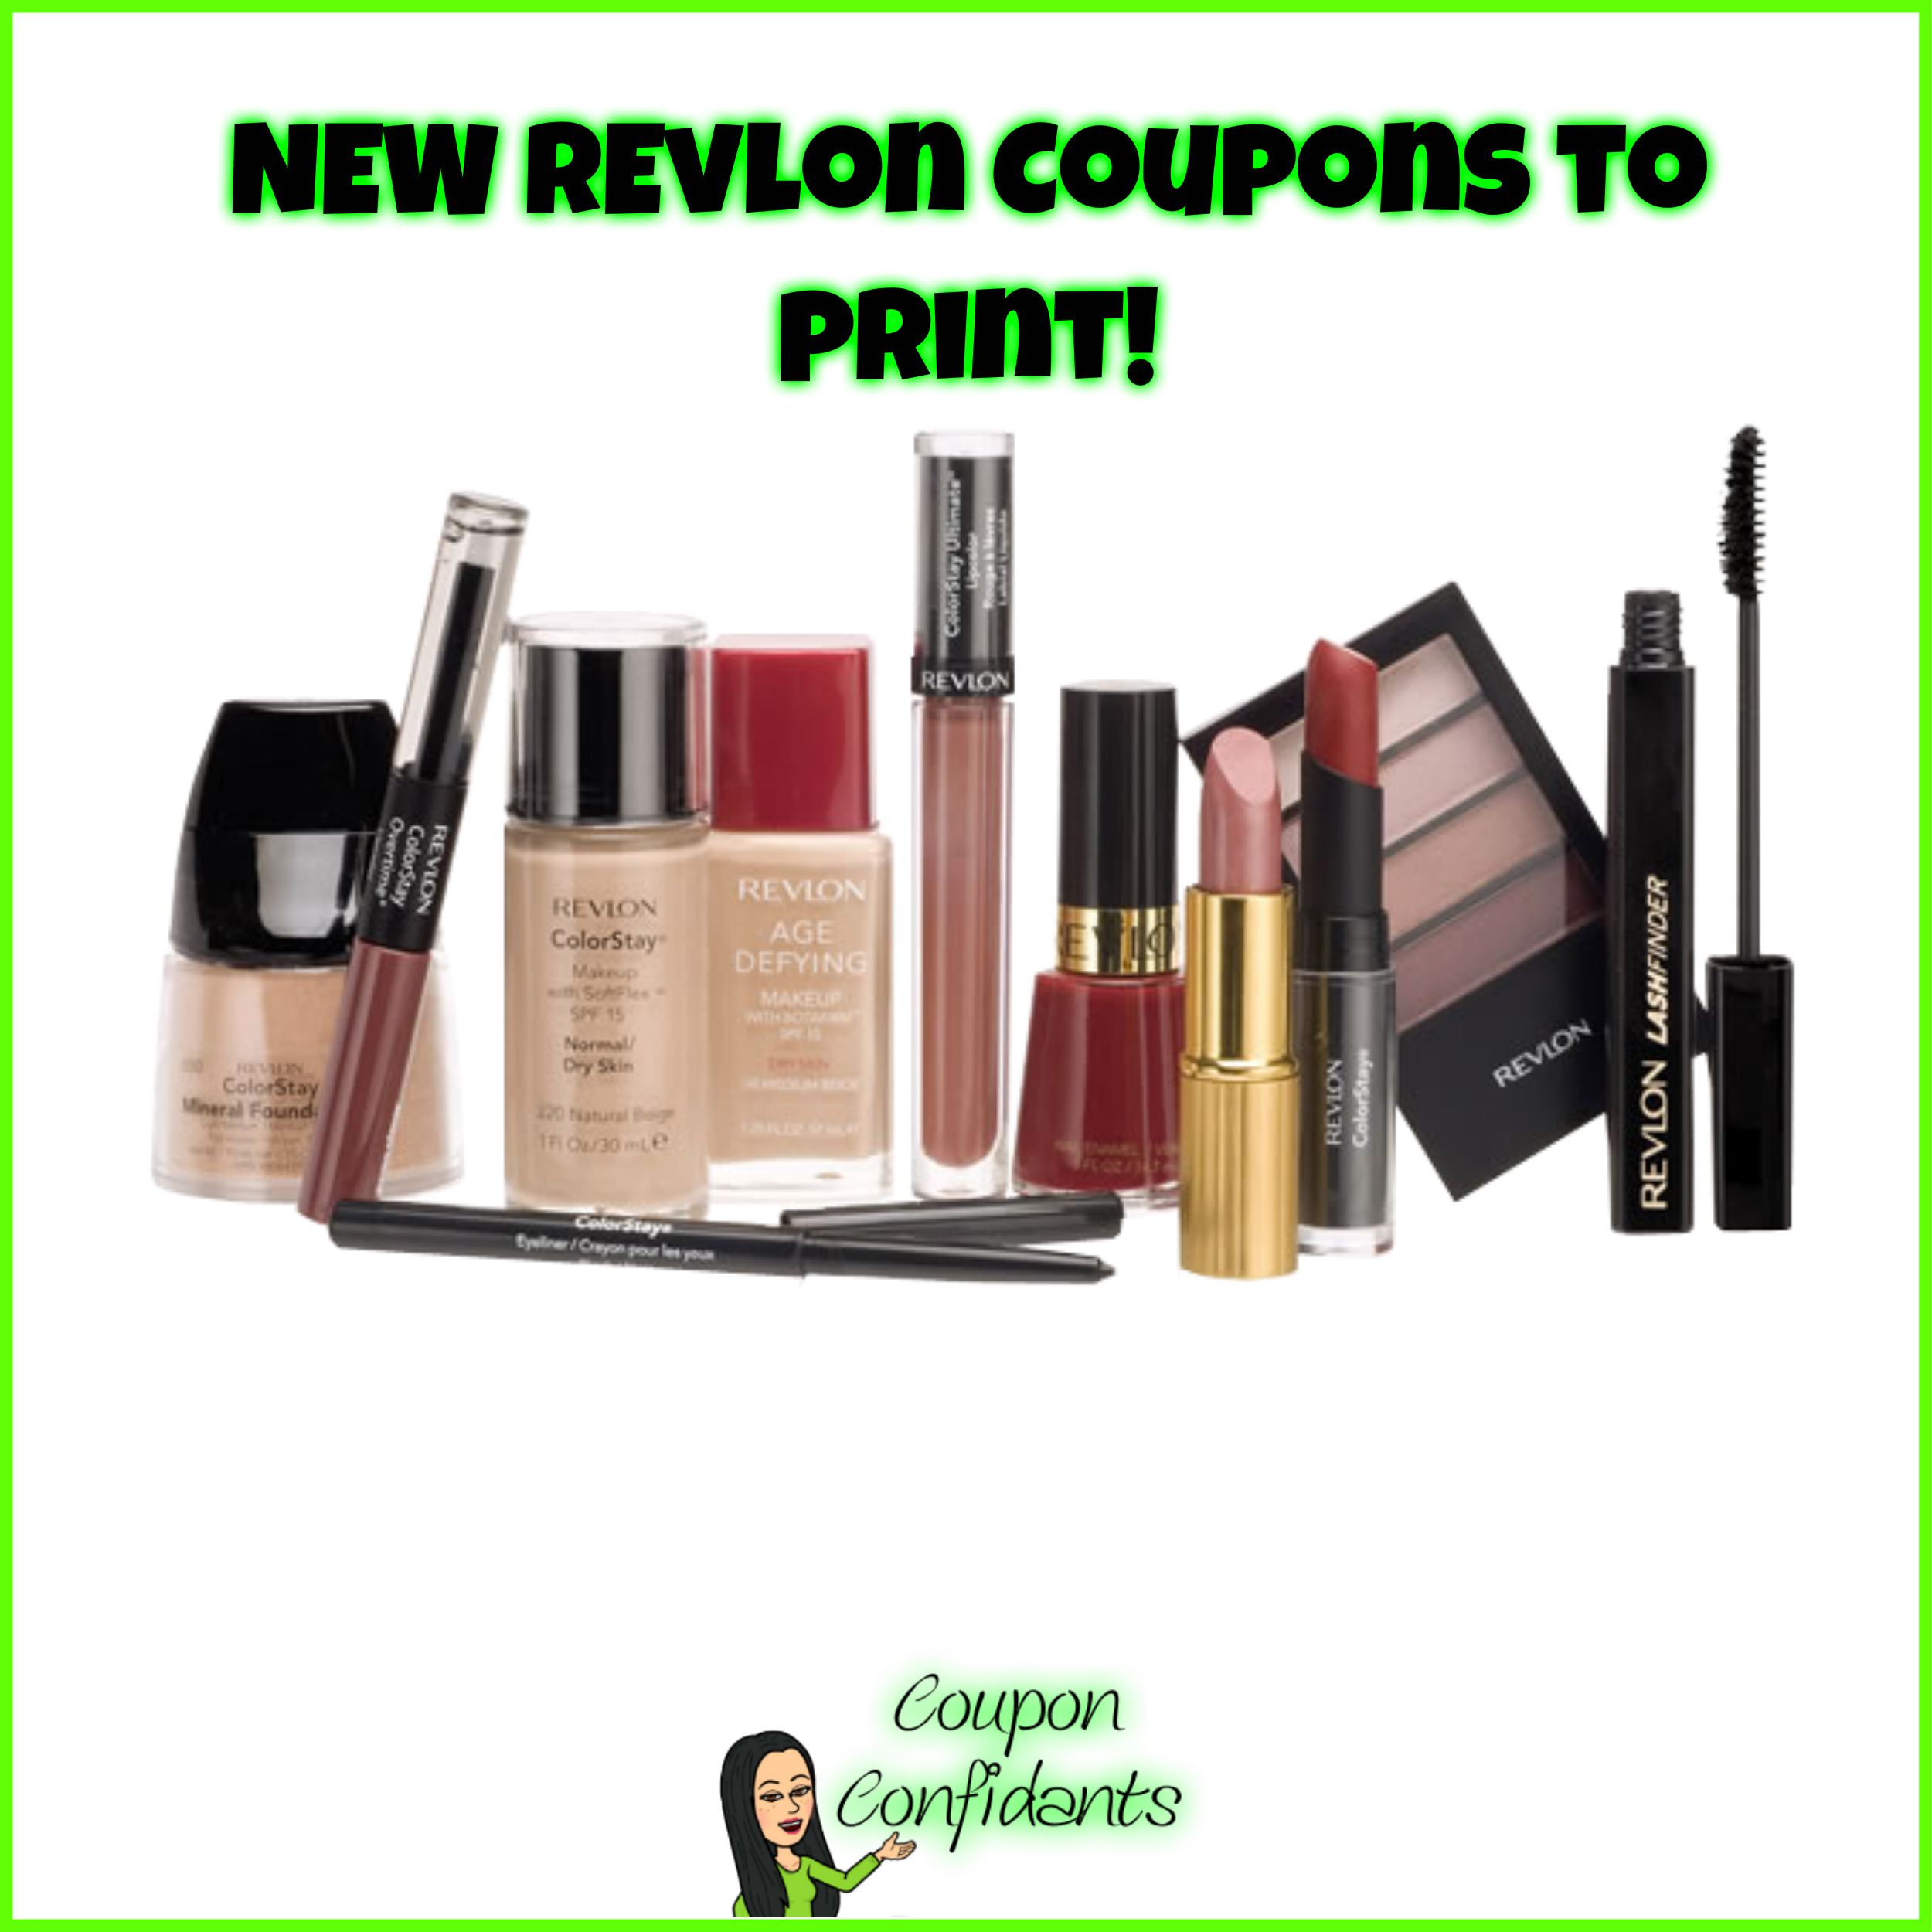 image about Printable Revlon Coupons titled Contemporary Revlon Coupon codes! ⋆ Coupon Confidants